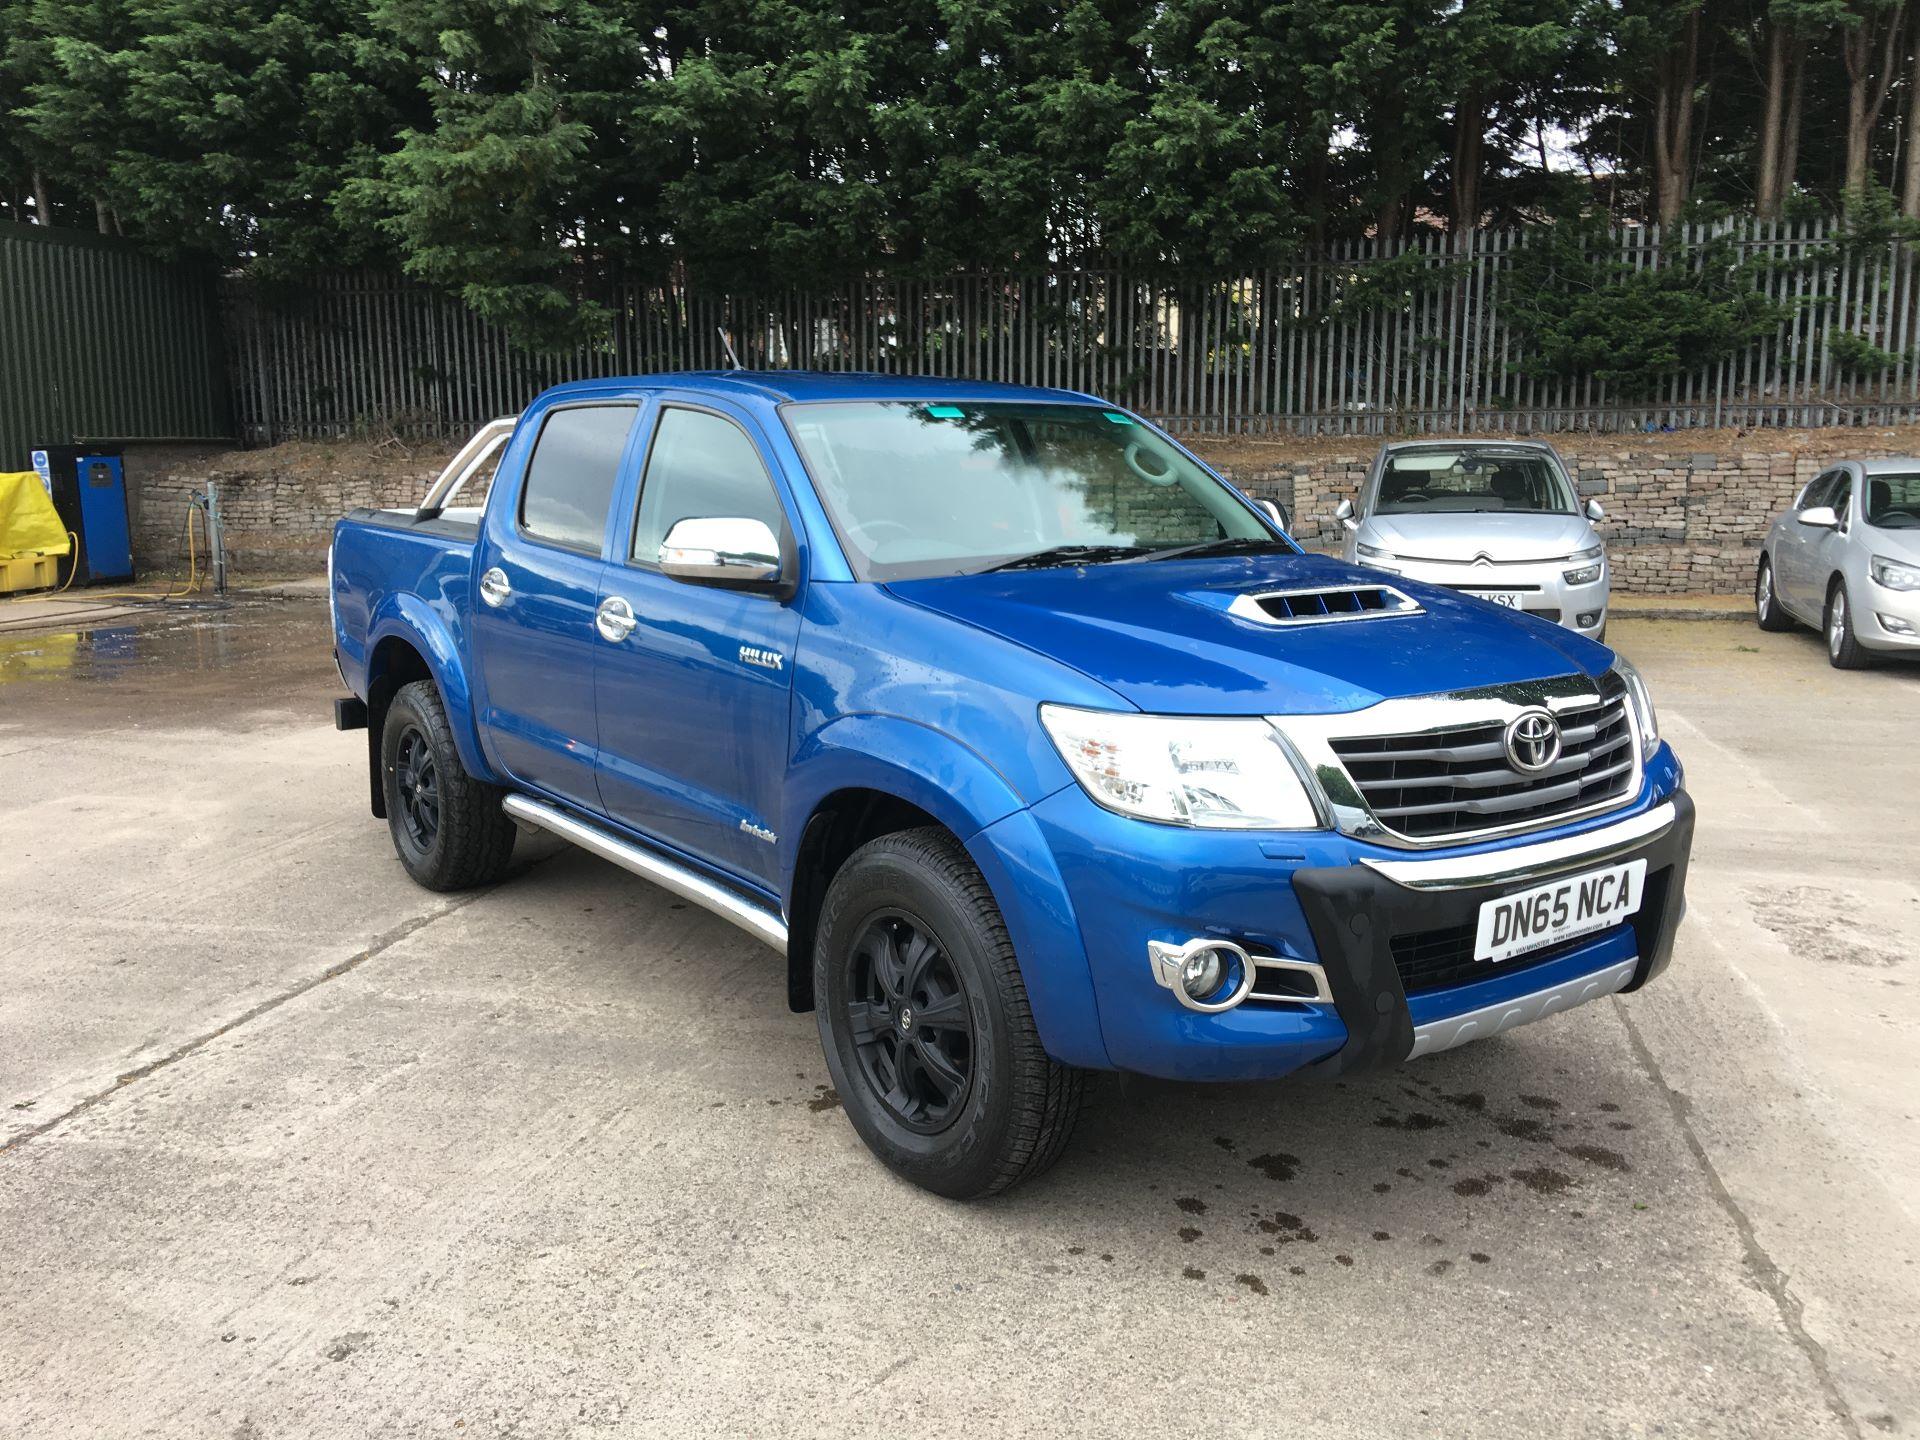 Toyota Hilux Vans for Sale Glasgow | Van Monster